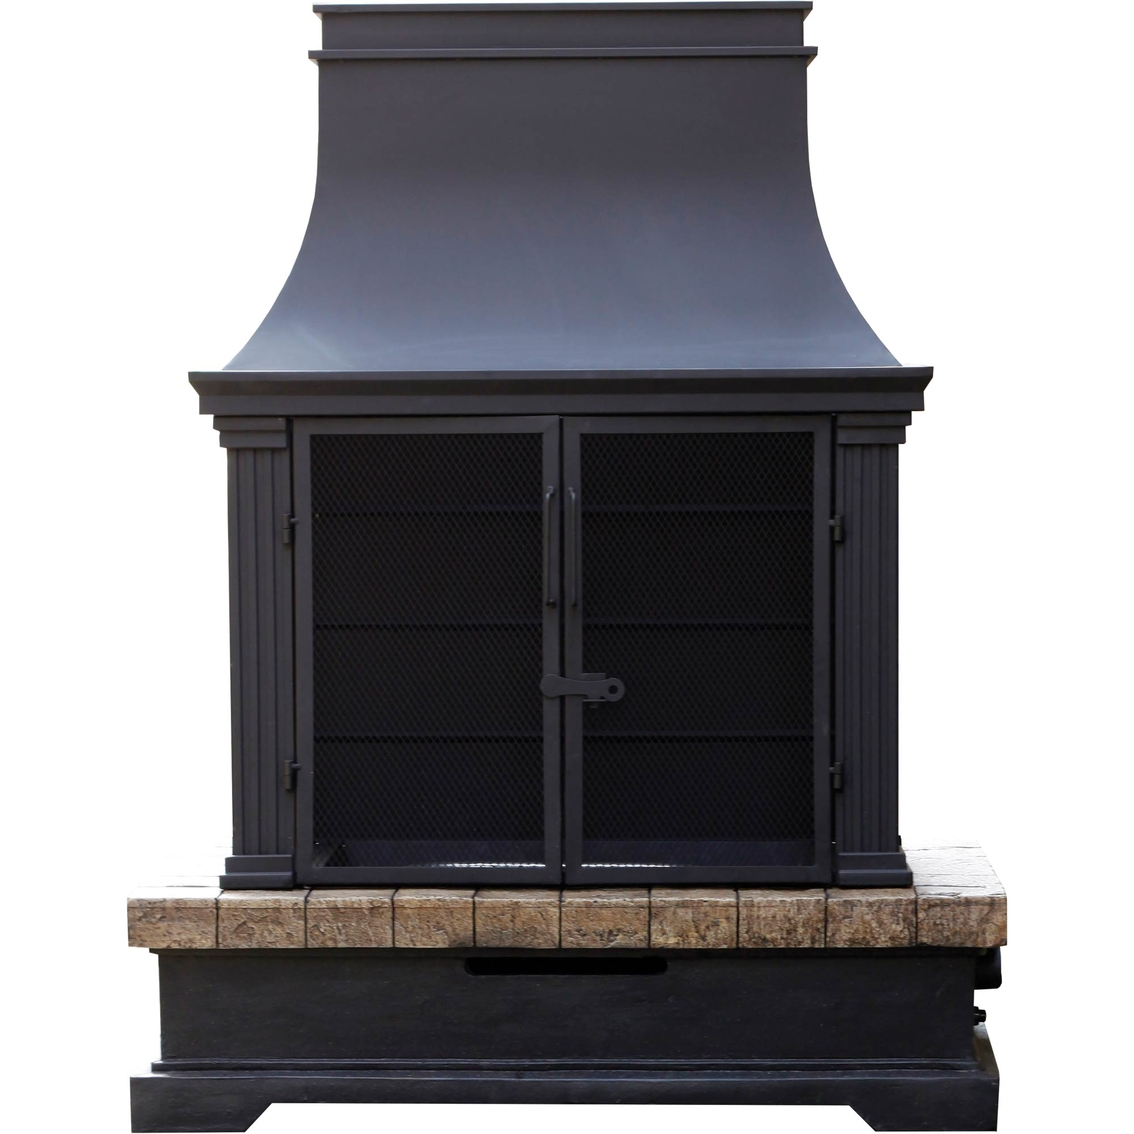 Bond Portofino Gas Fireplace Outdoor Heating More Shop The